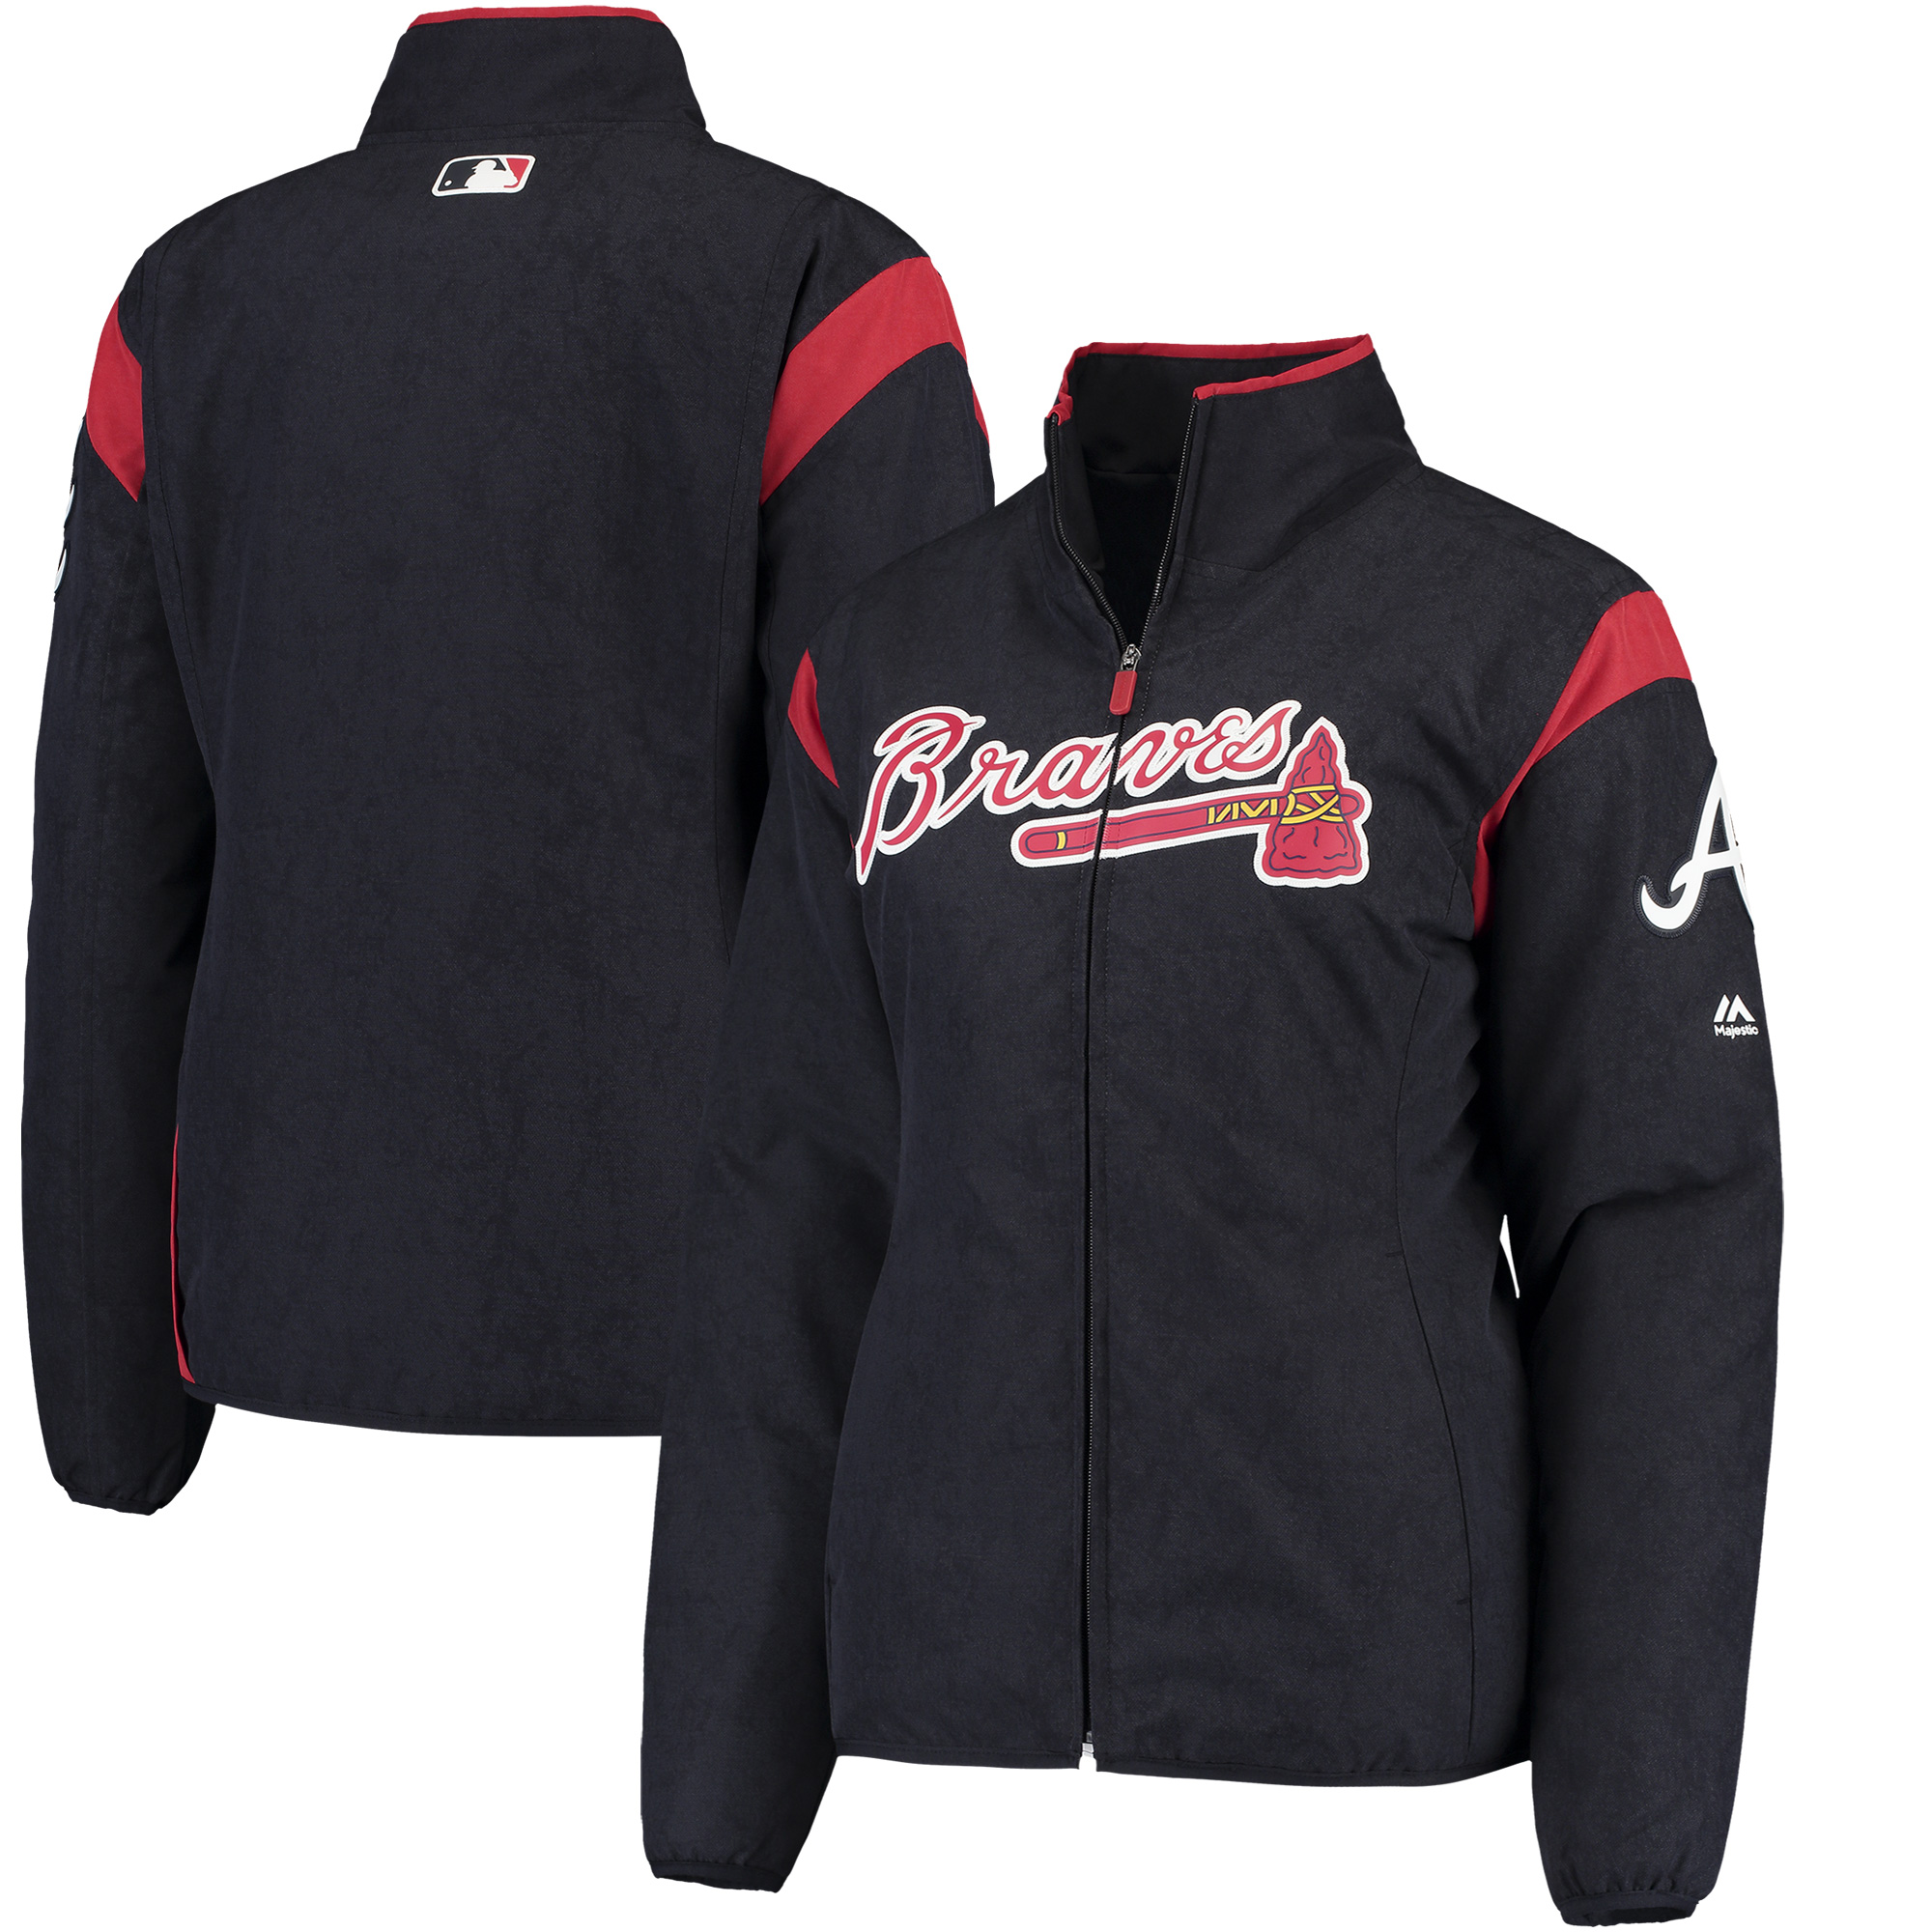 Atlanta Braves Majestic Women's On-Field Thermal Jacket - Navy